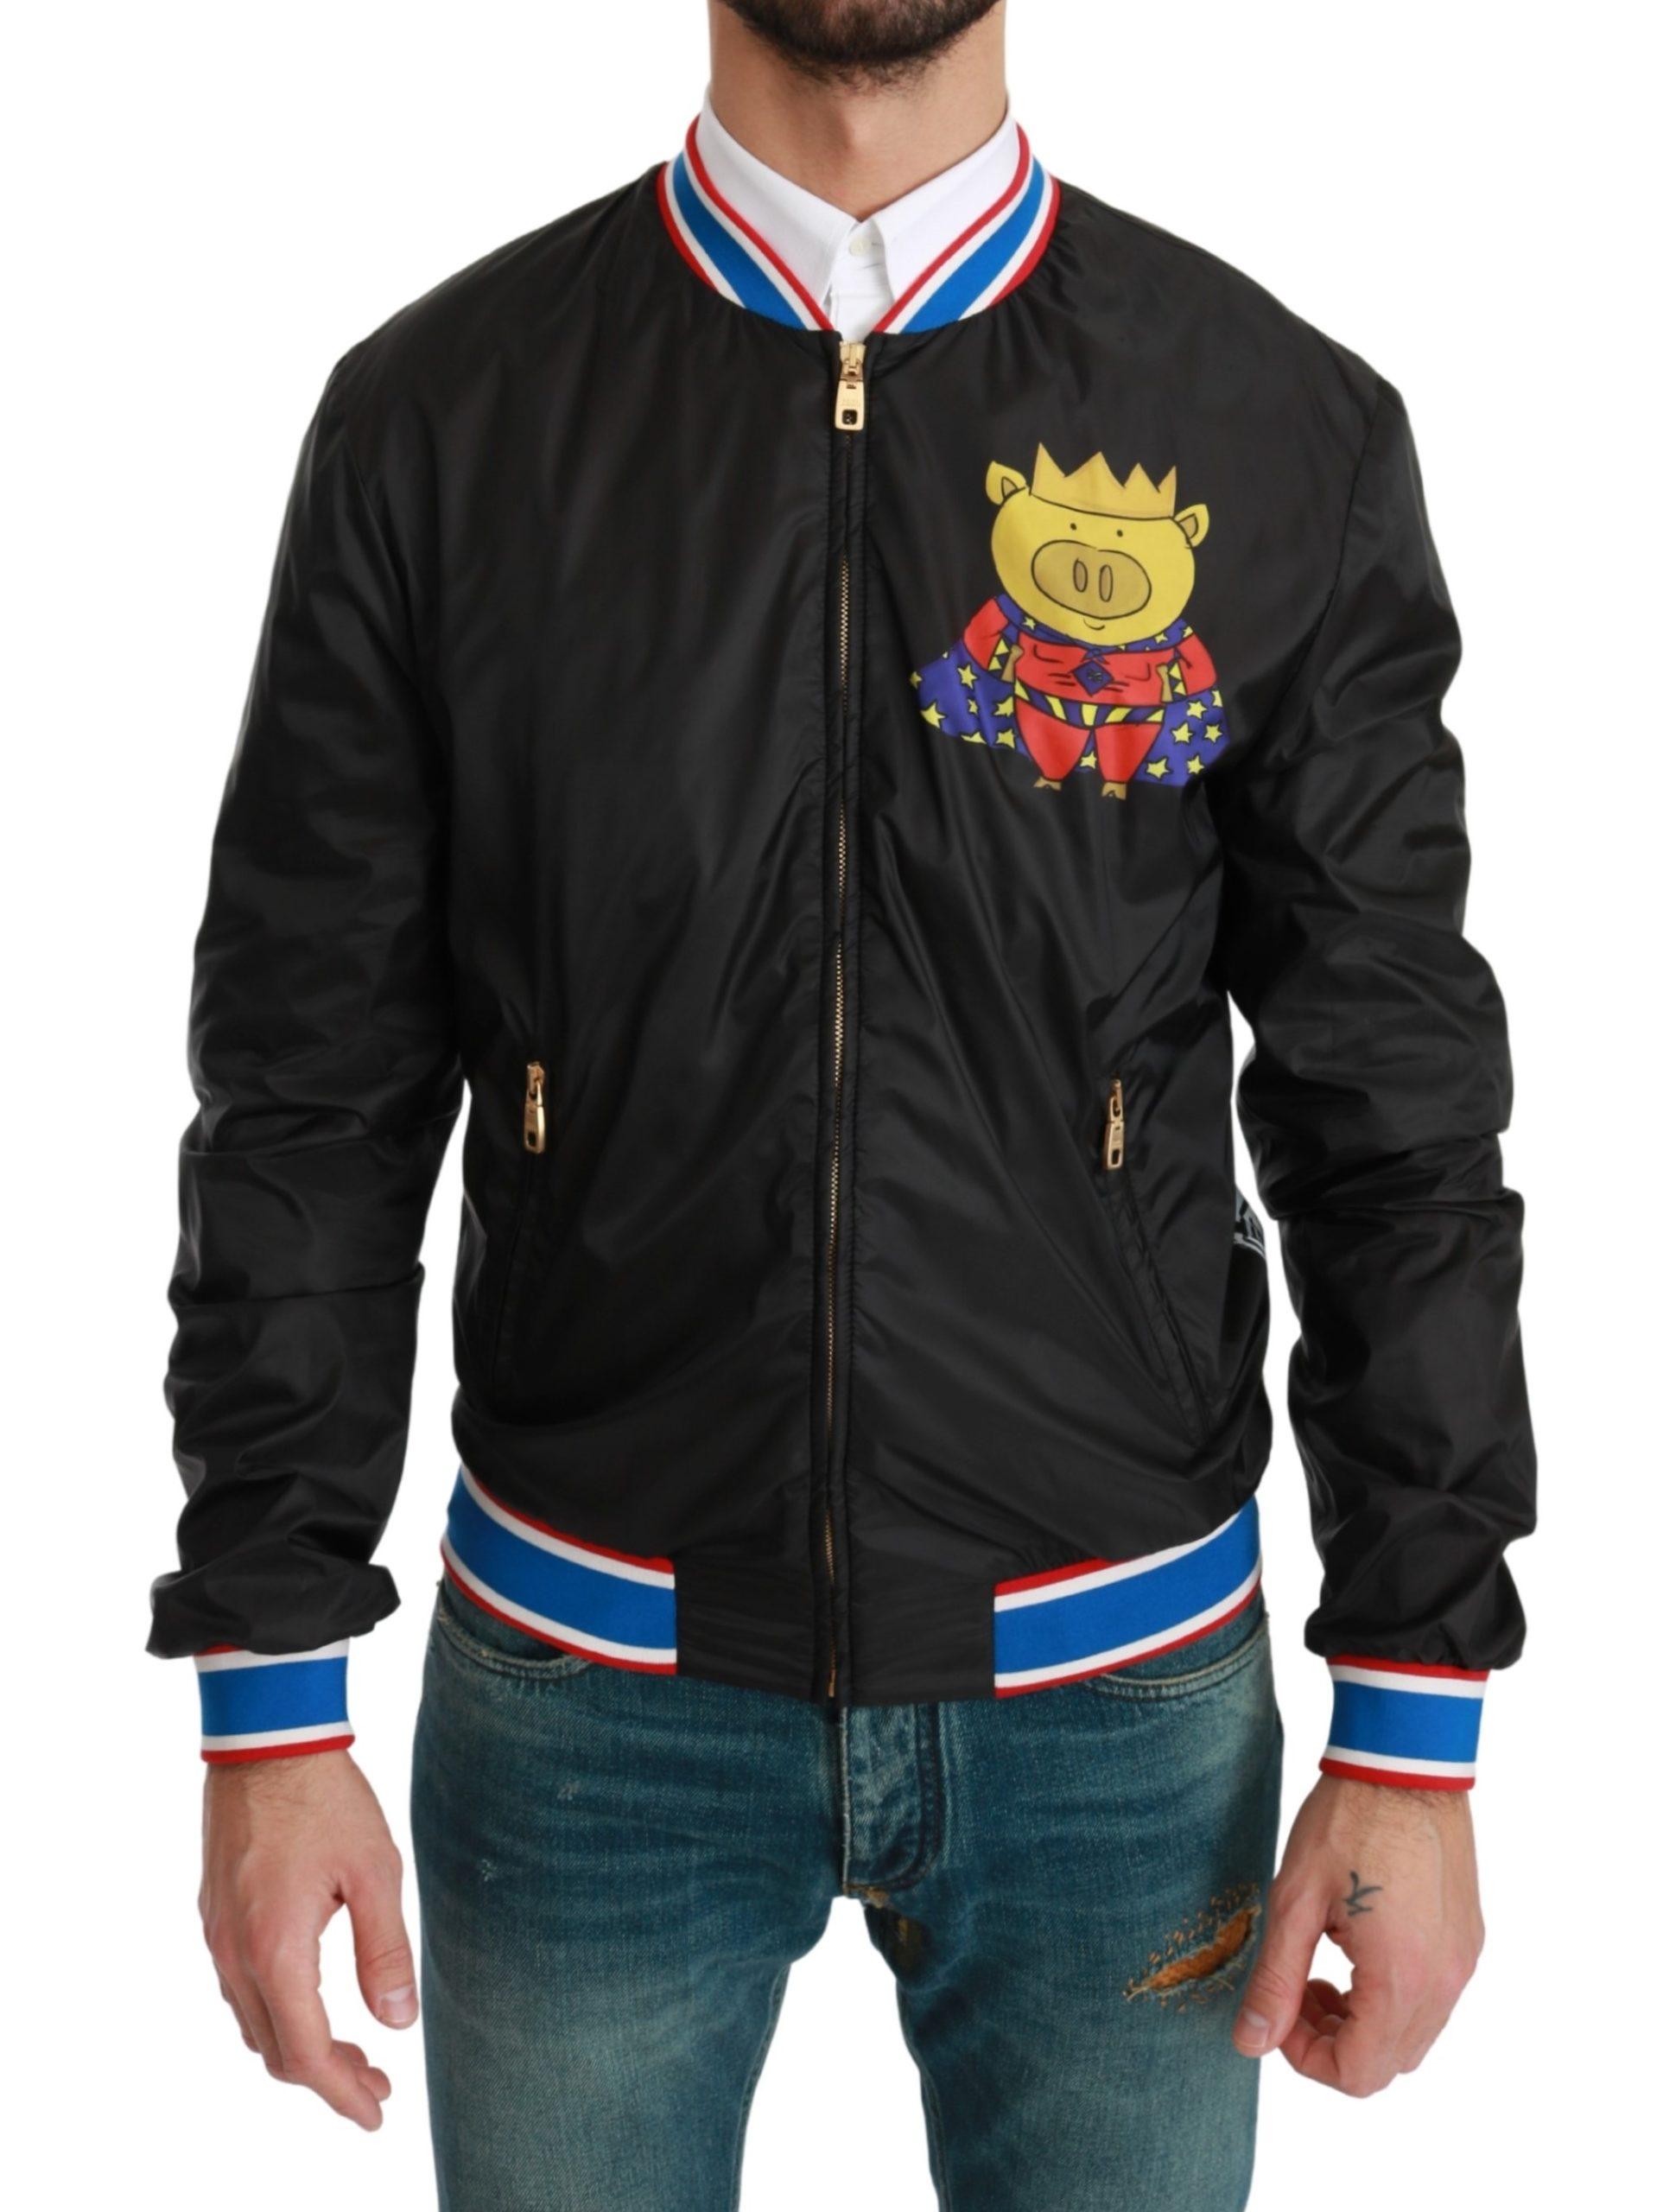 Dolce & Gabbana Men's YEAR OF THE PIG Bomber Jacket Black JKT2599 - IT44 | XS